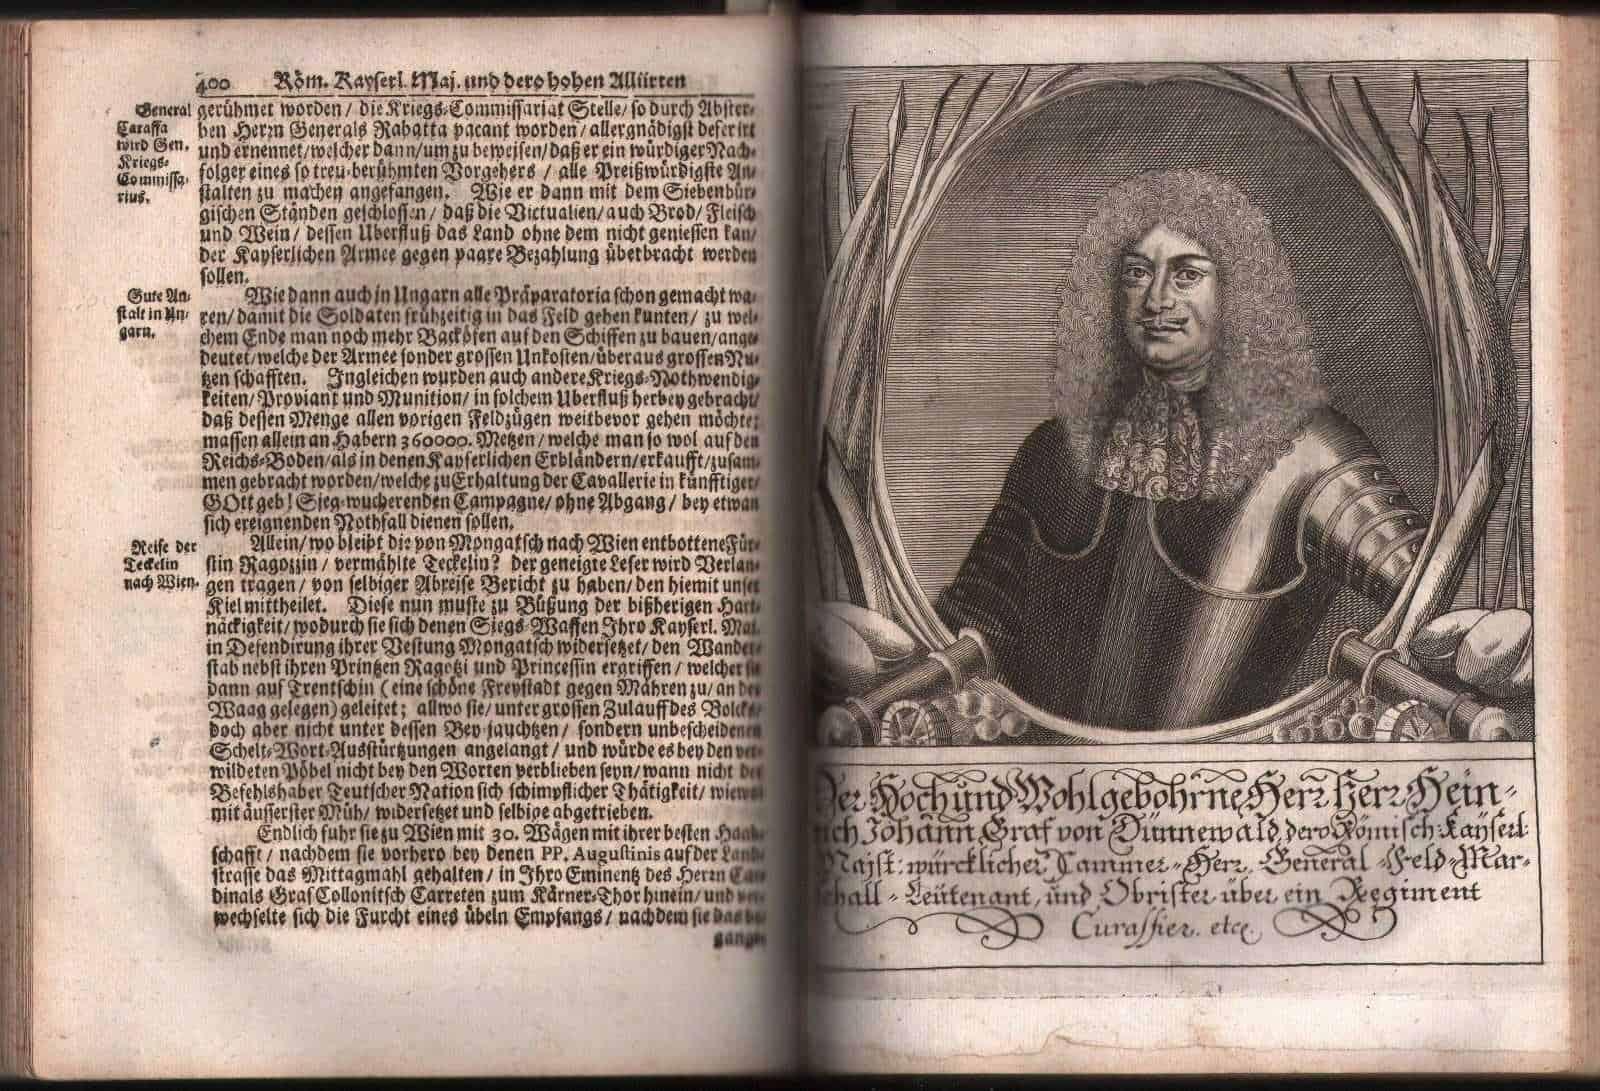 1688-Boethius-TRIUMPH-LEUCHTENDEN-KRIEGS-HELMS-Vol-3-History-Christian-Ottoman-401133054023-10